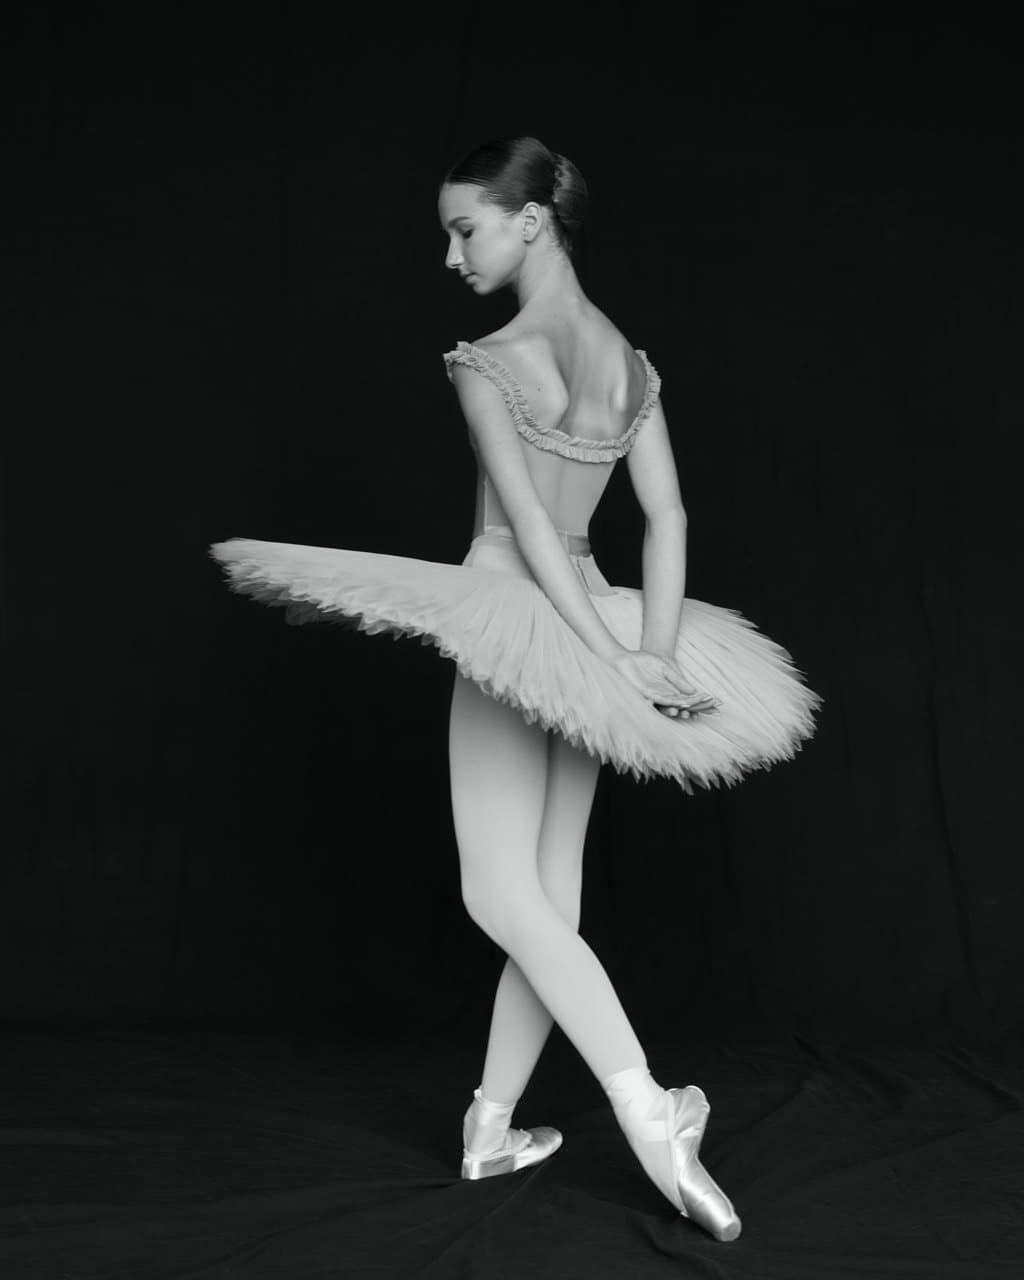 Alisa Aslanova On Instagram Young Ballerina Student Of The Bolshoiballetacademy Official Victoriya Yaralova Victoriaya Ballet Shoes Fashion Flapper Dress